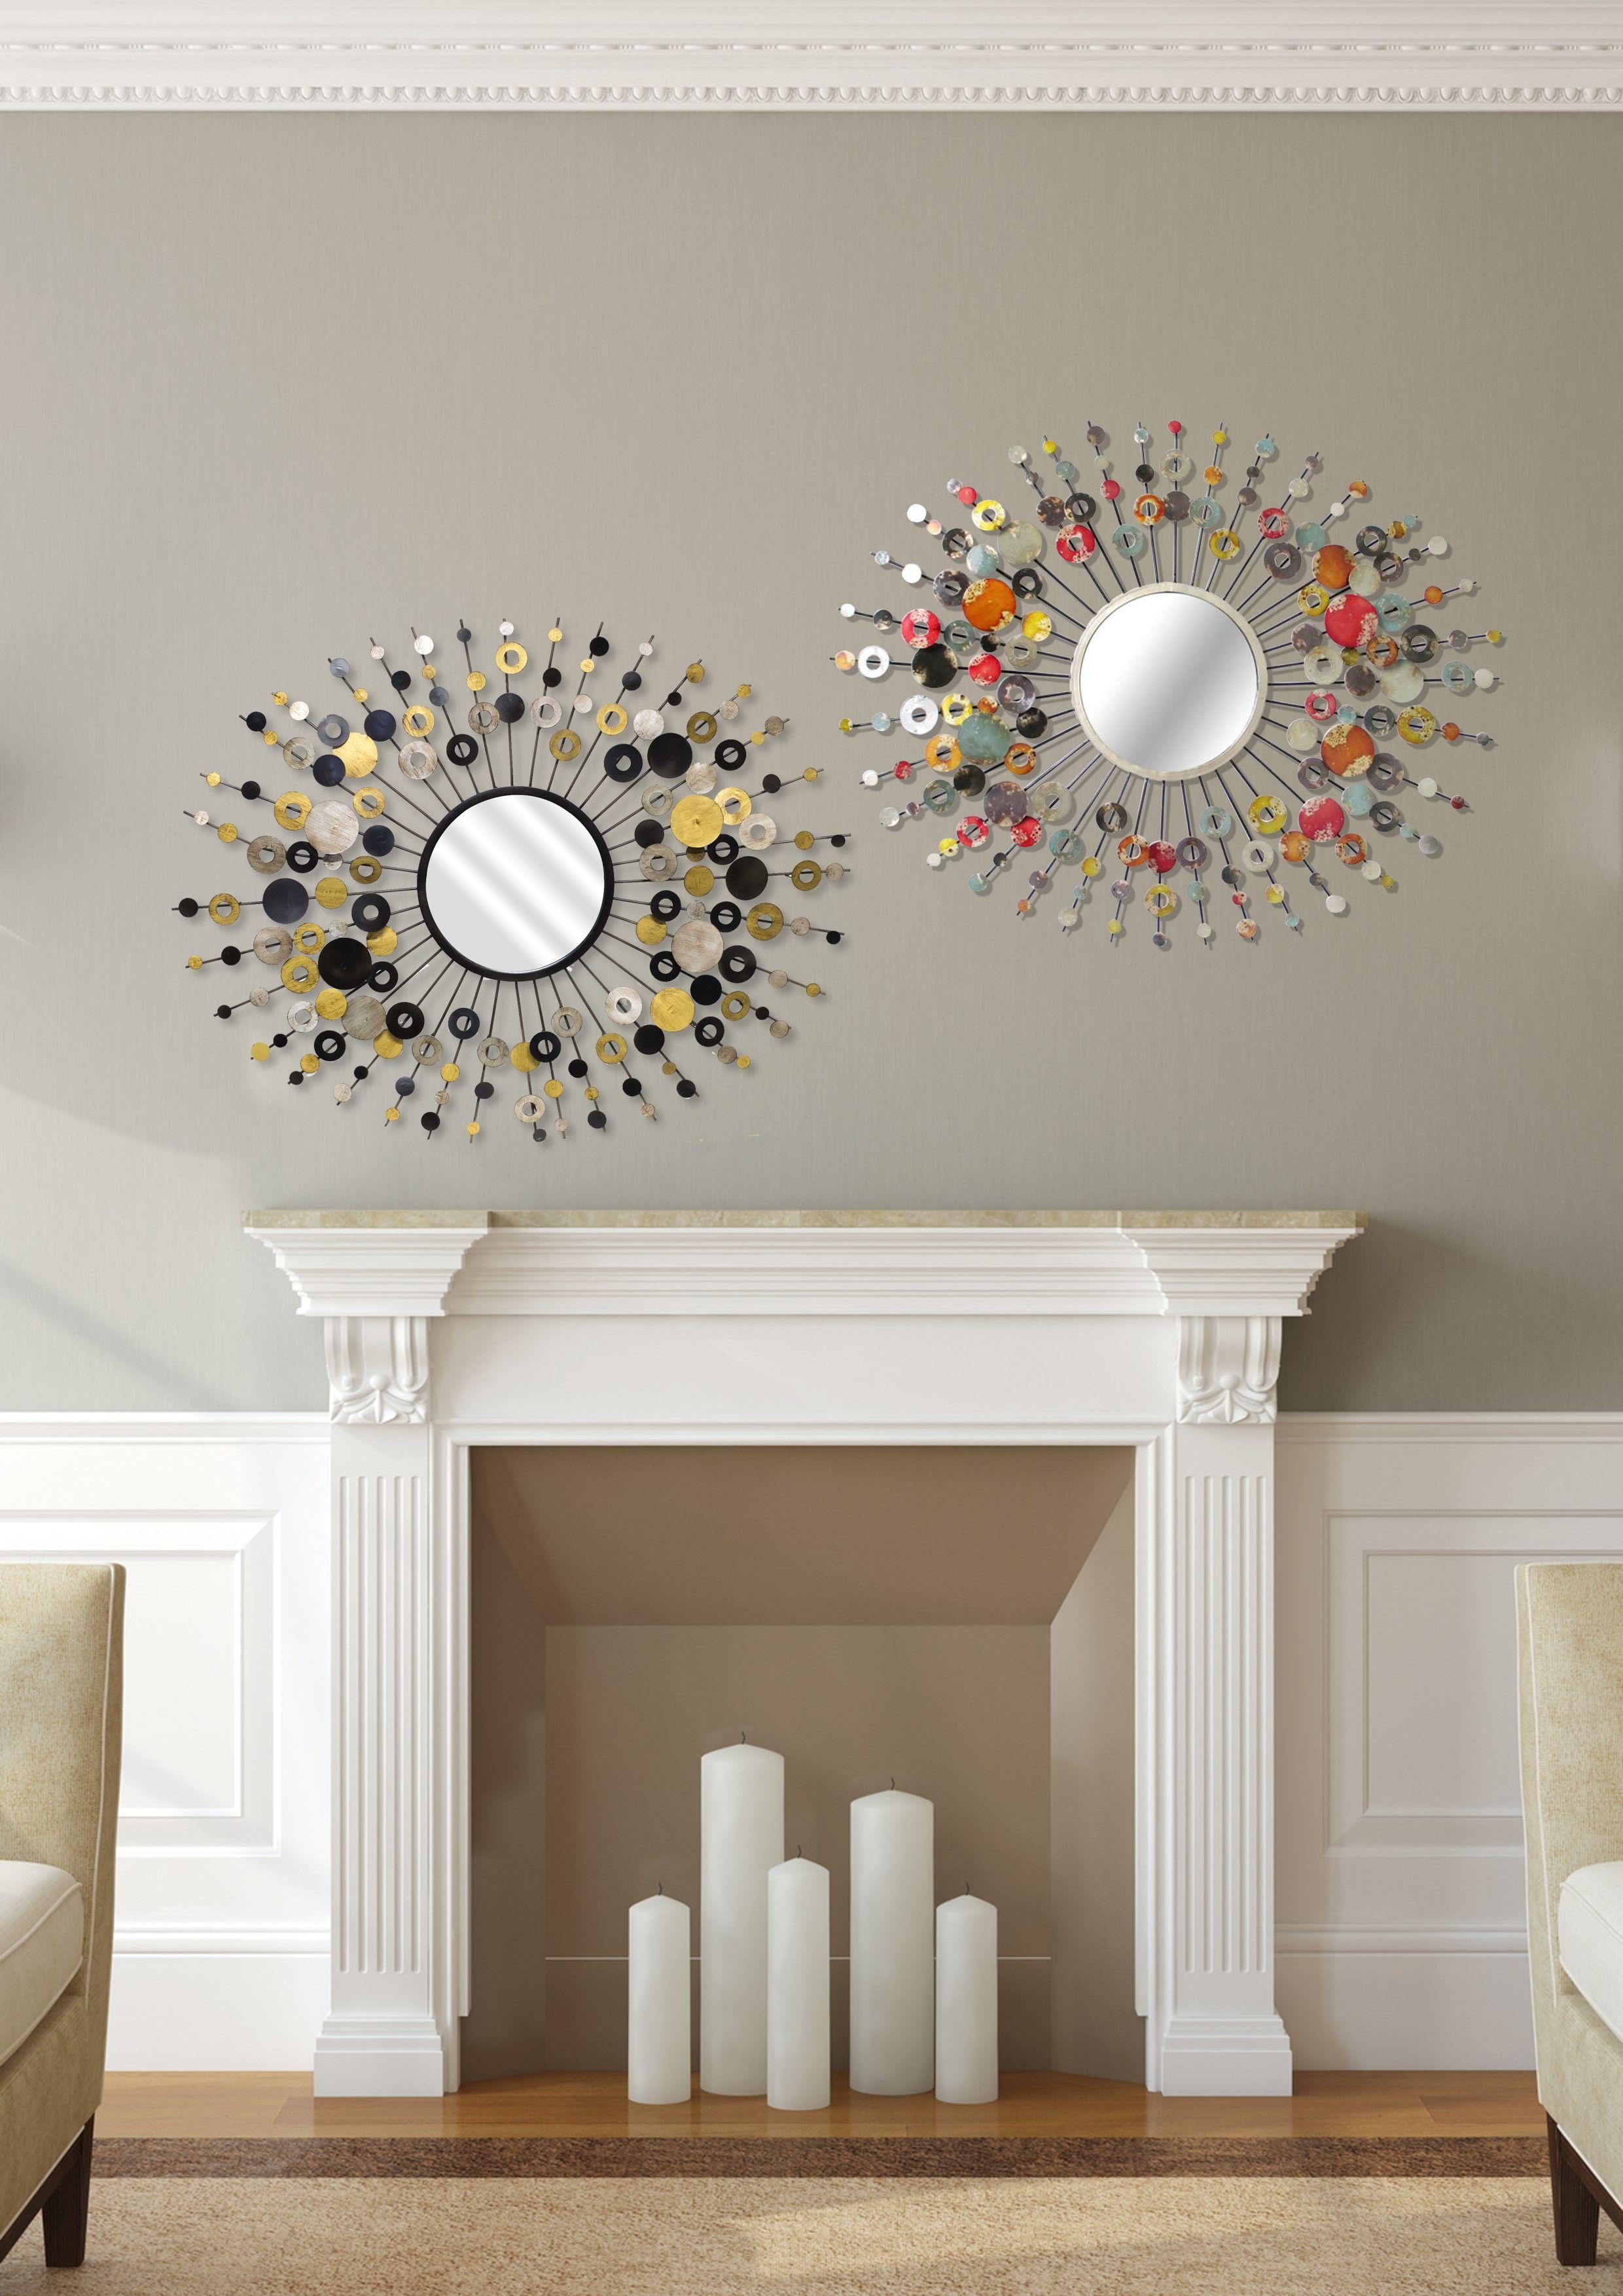 miroir soleil mural en m tal noir pastilles or argent. Black Bedroom Furniture Sets. Home Design Ideas